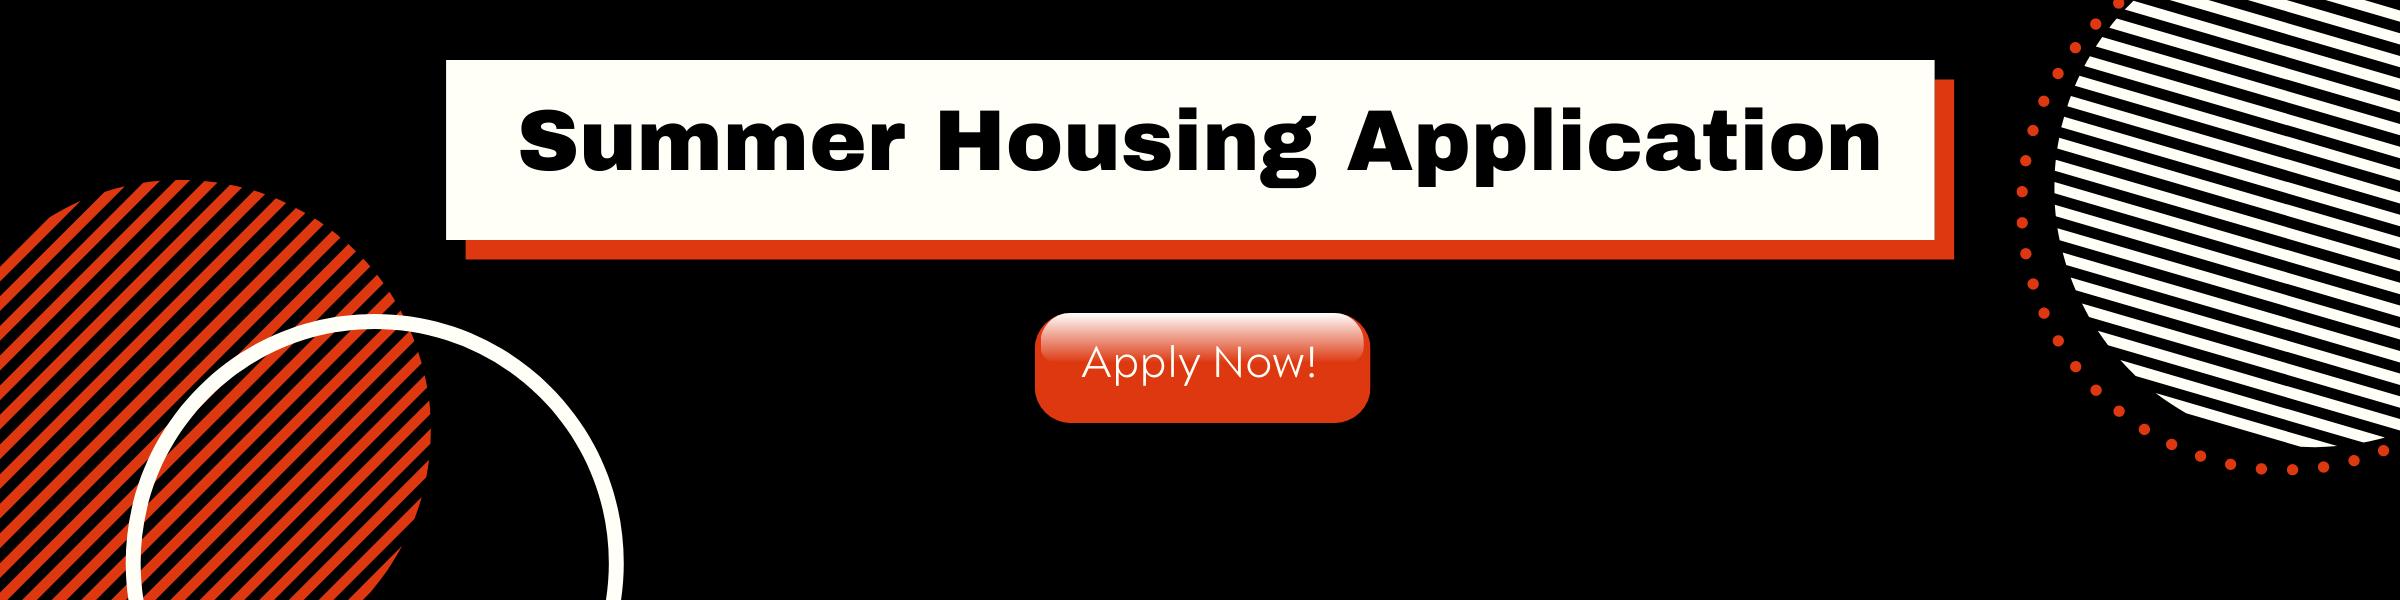 Summer Housing App